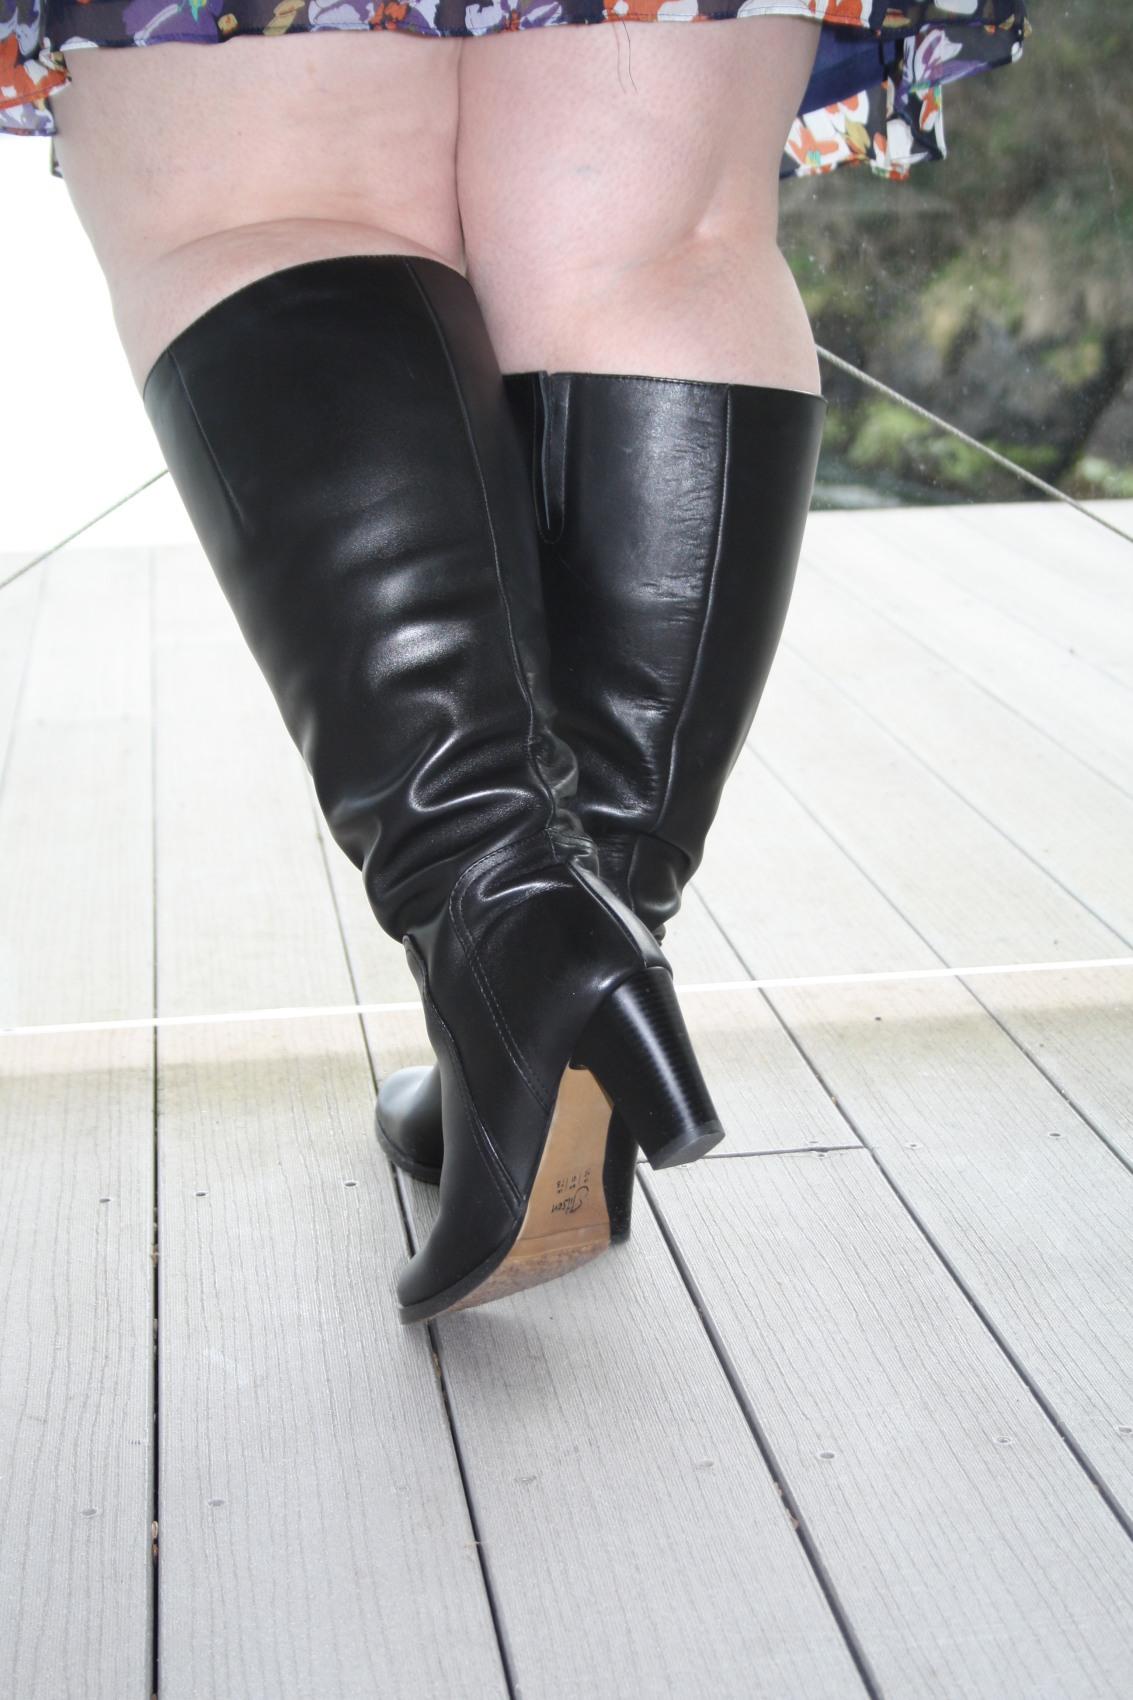 Bbw with high heels